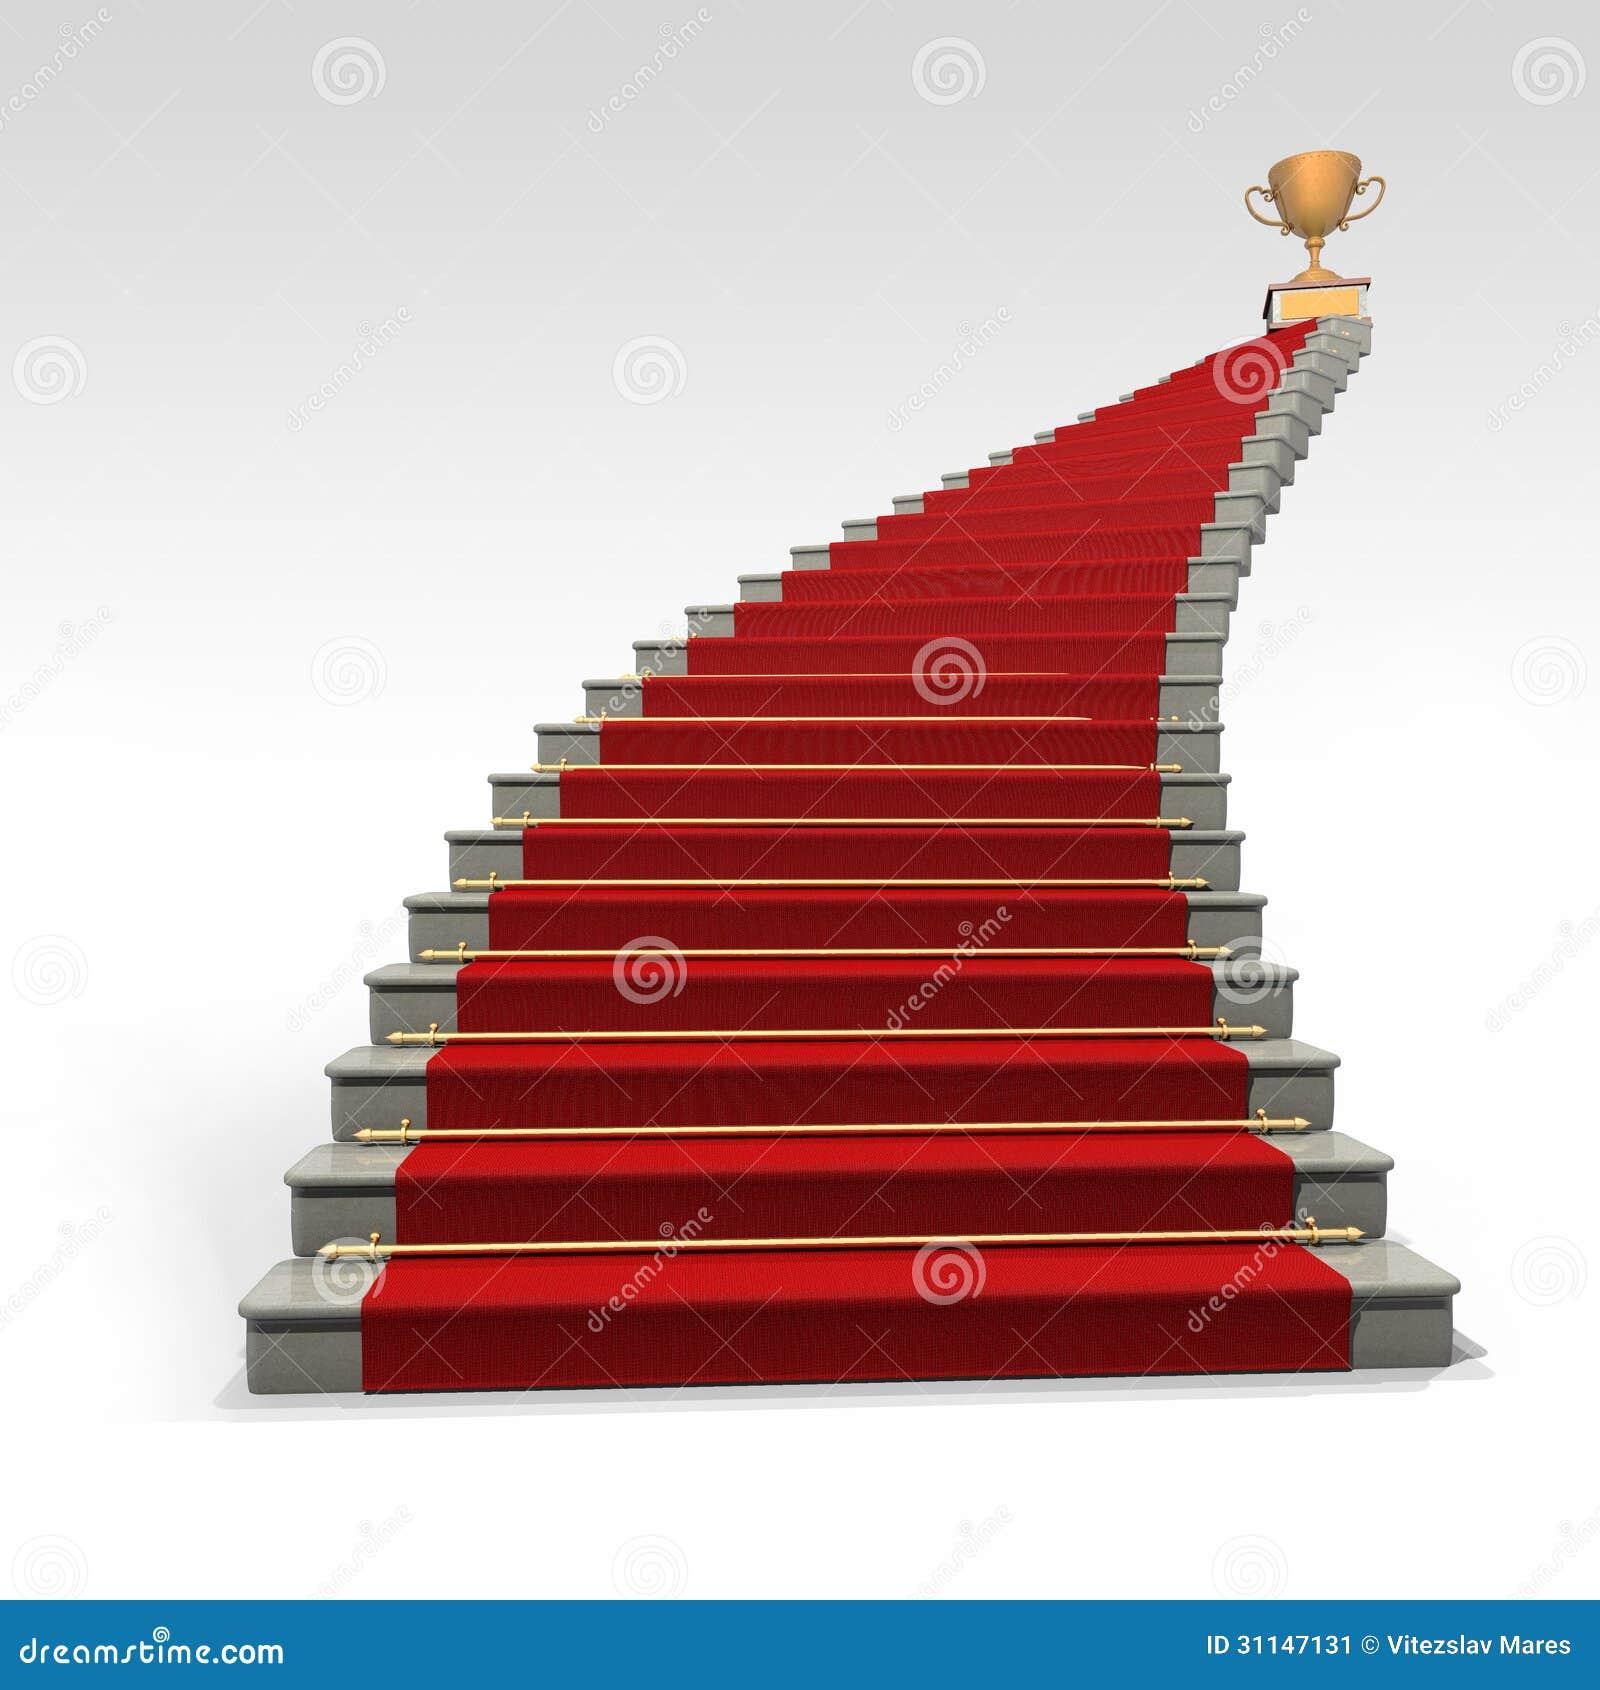 treppe und roter teppich stockbild bild 31147131. Black Bedroom Furniture Sets. Home Design Ideas